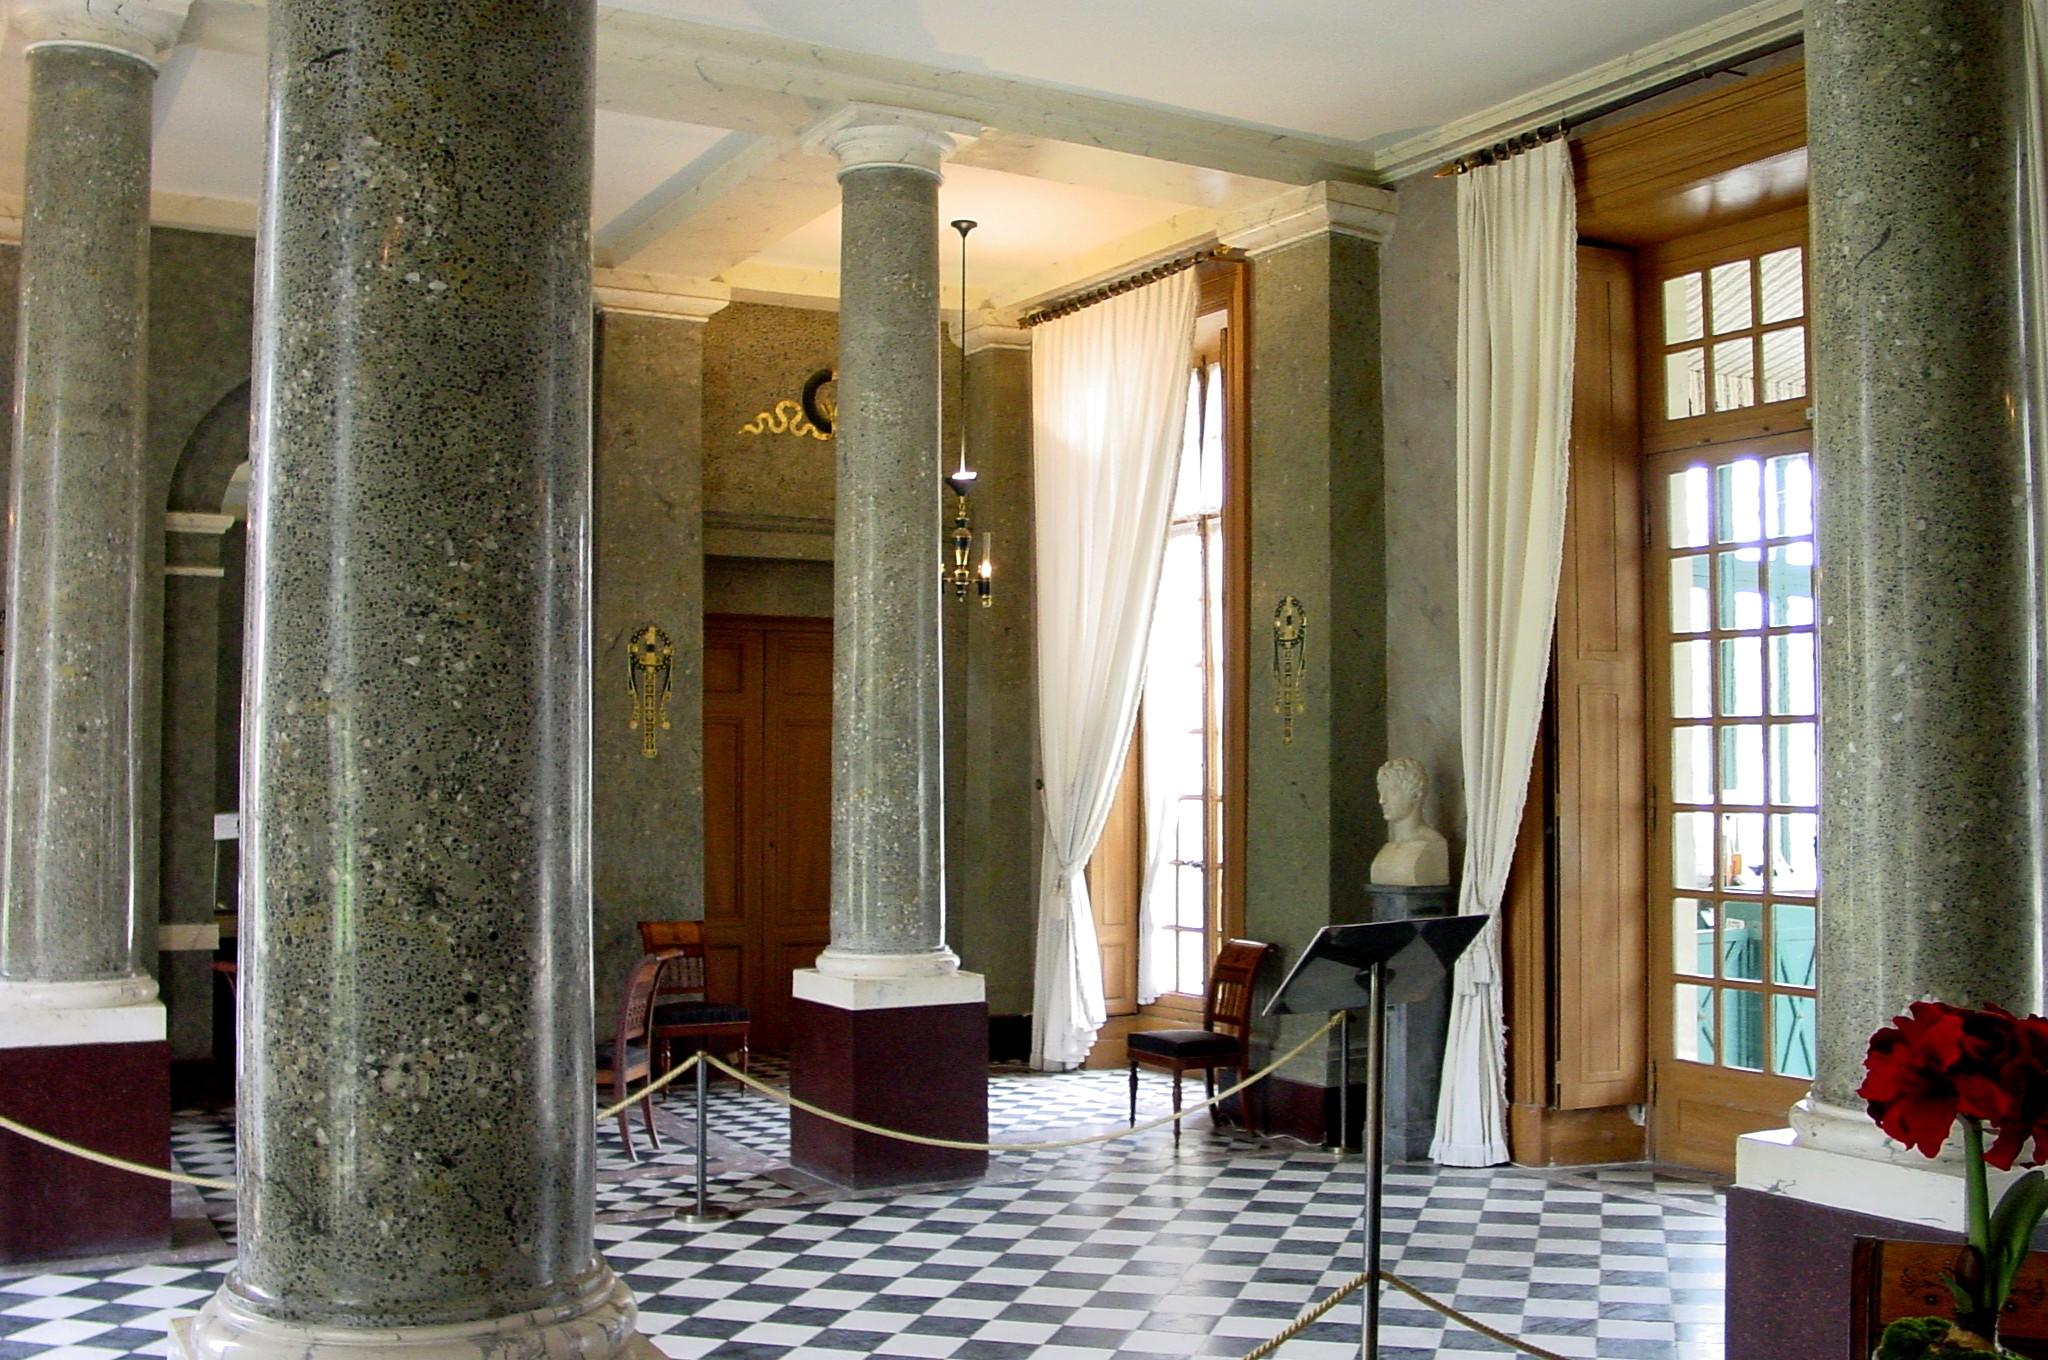 Josephine Chateau de Malmaison